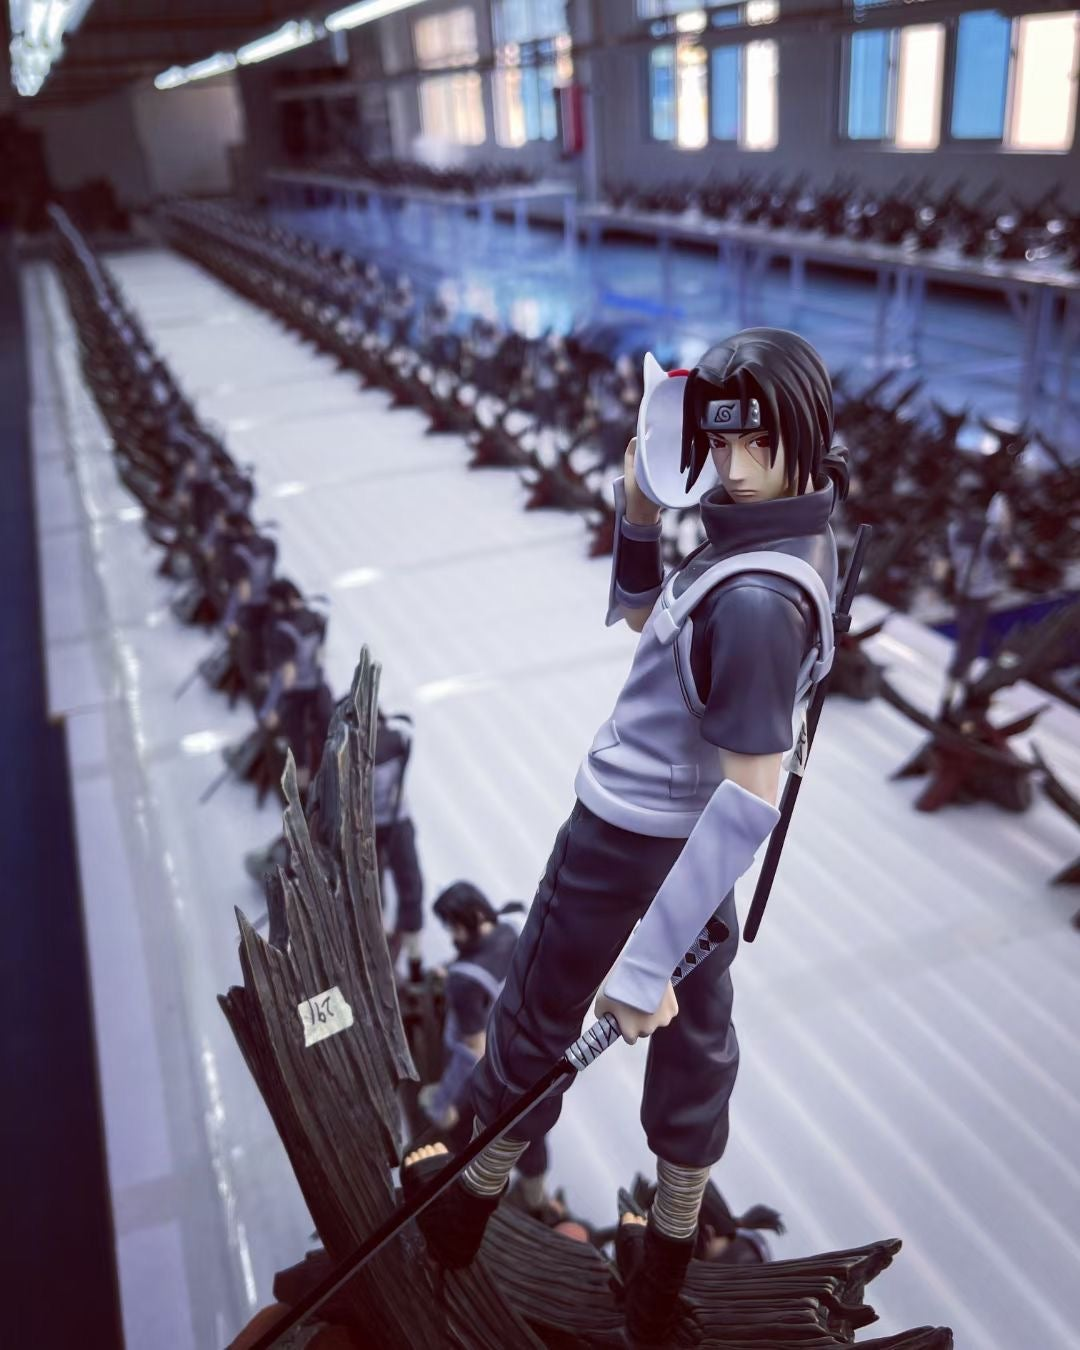 Image of [In-Stock]Naruto MH Studio Itachi Anbu Resin Statue